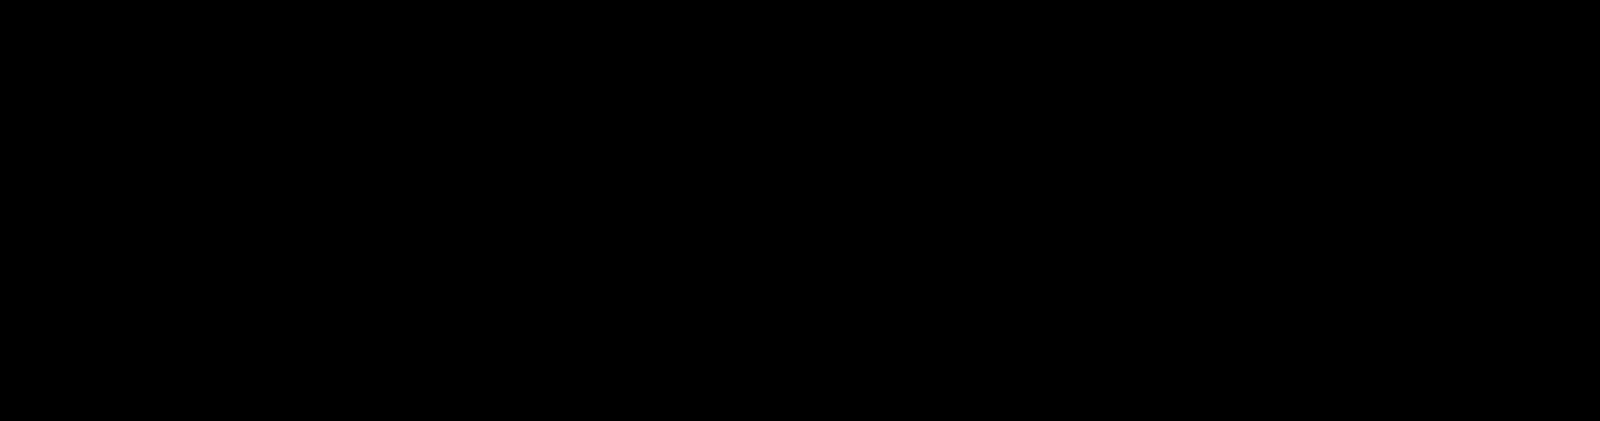 image63.png